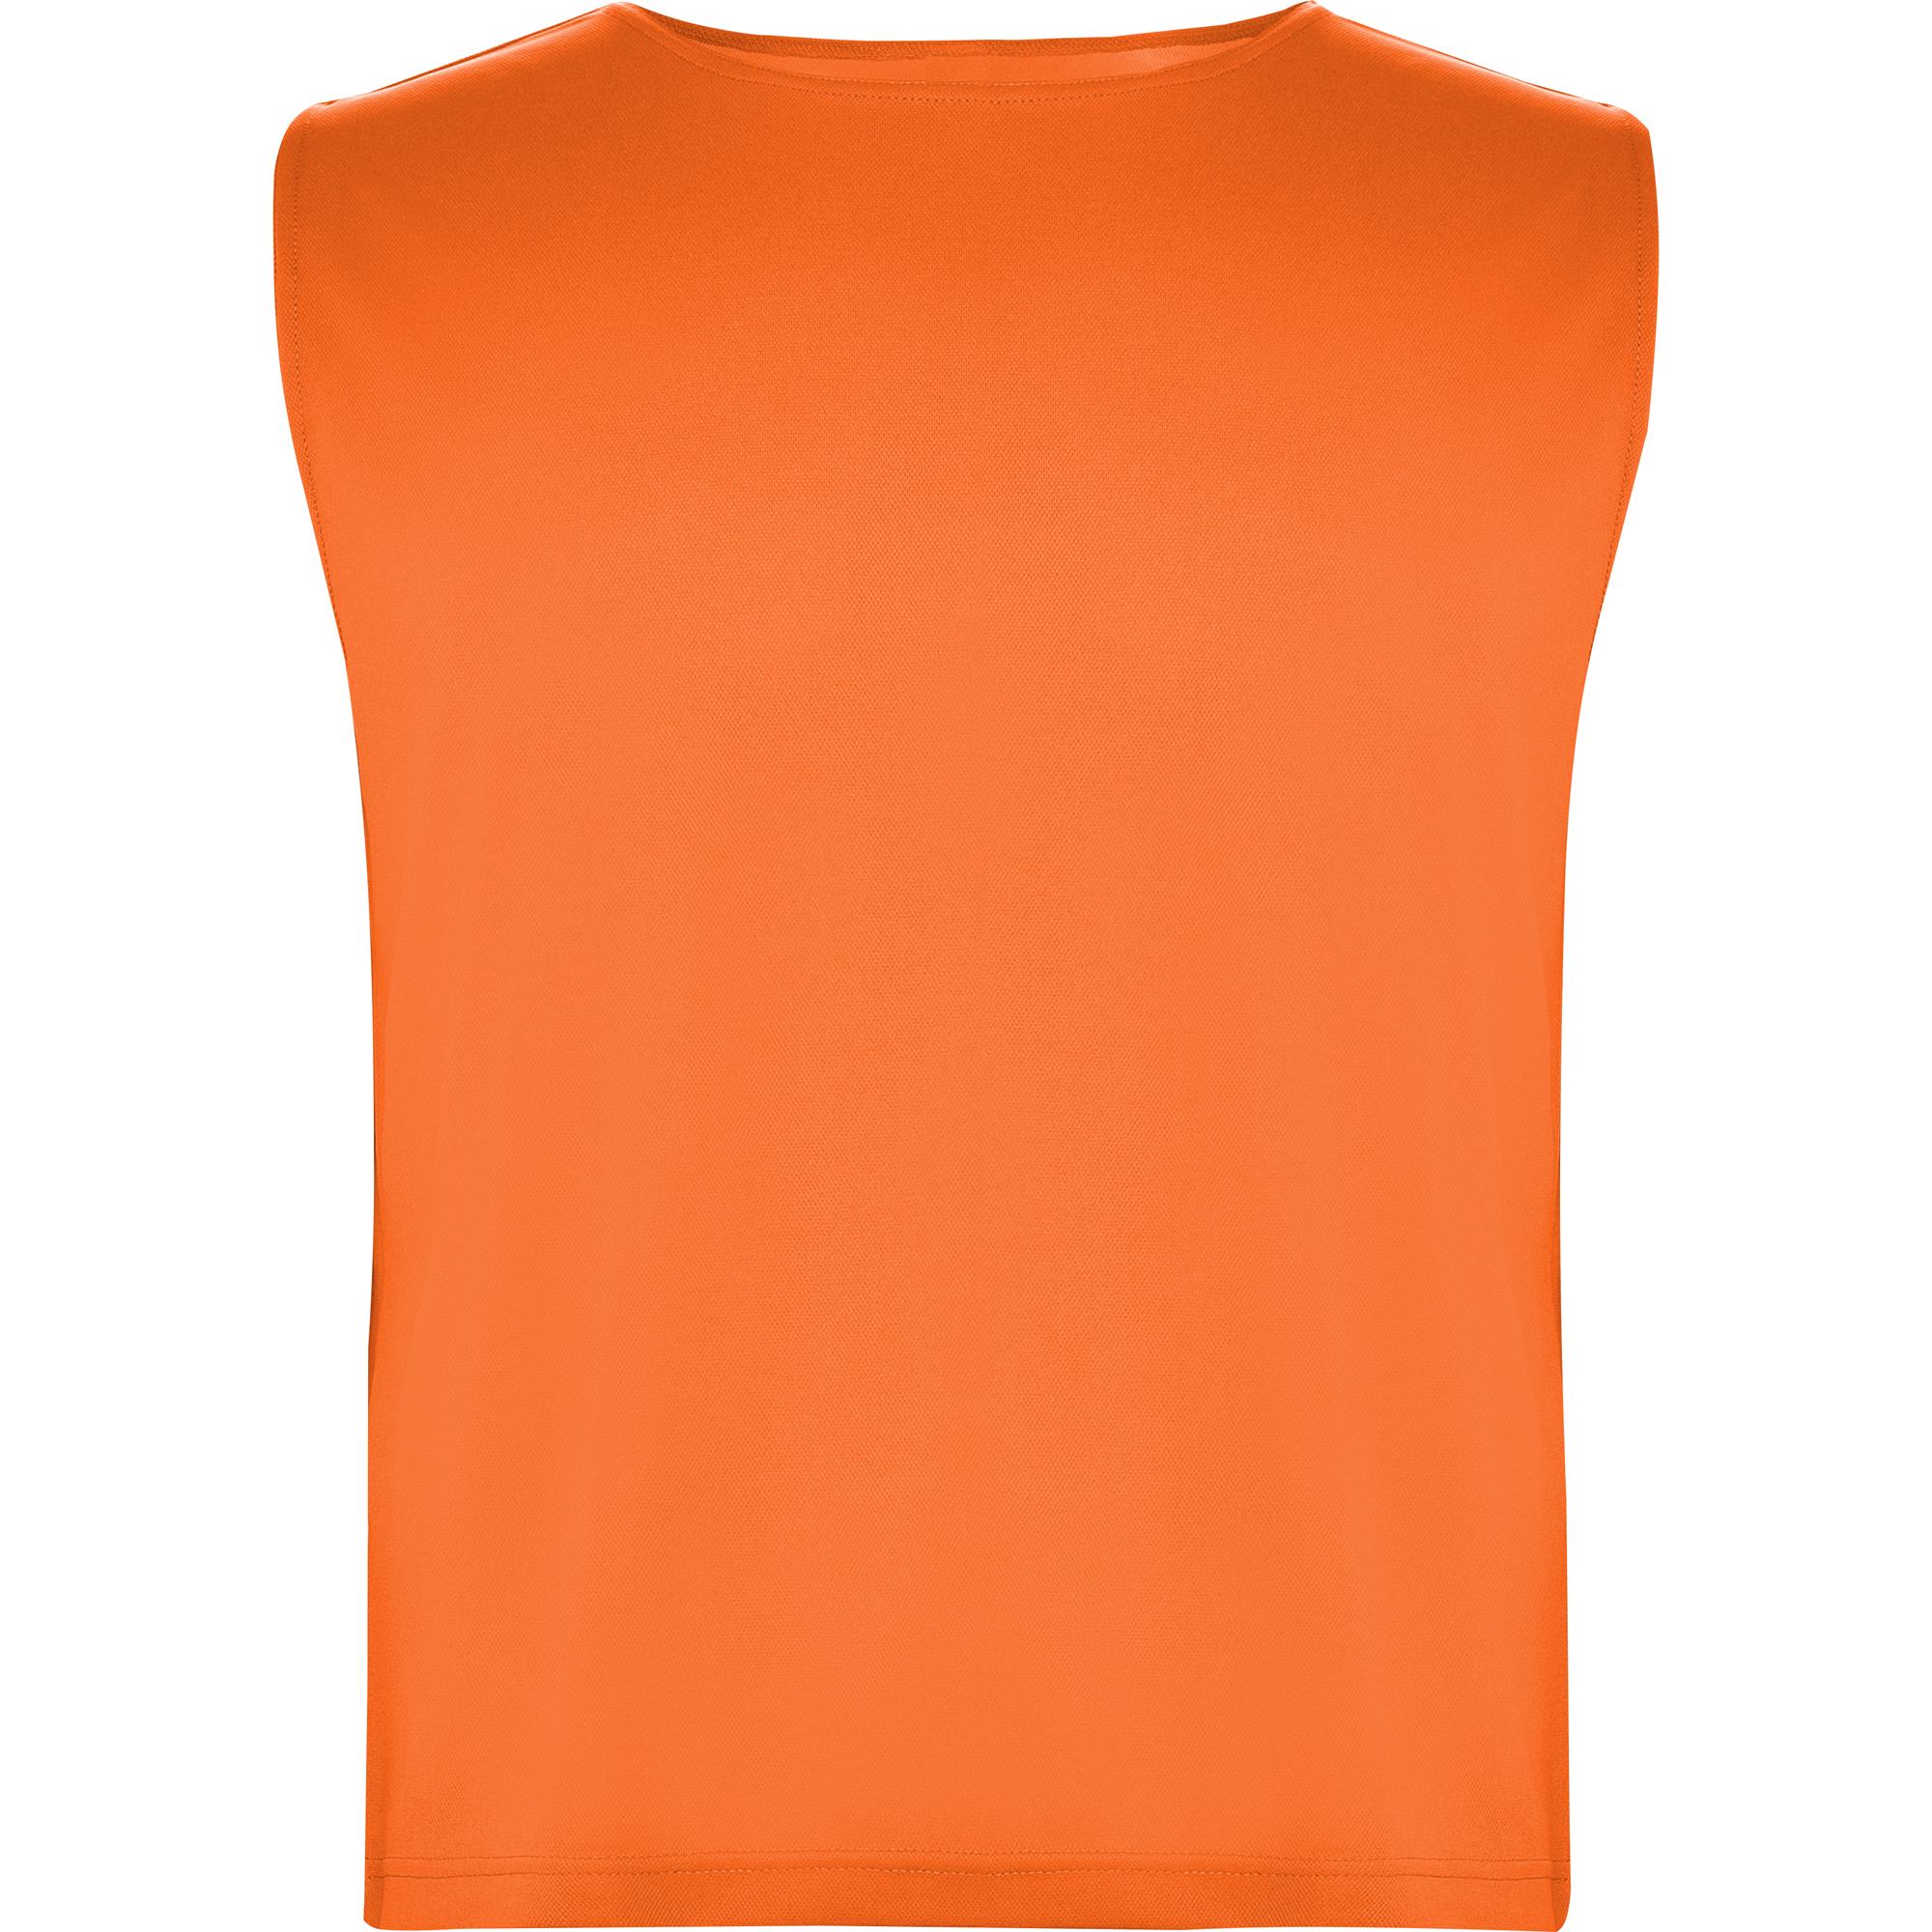 223 Naranja Fluor